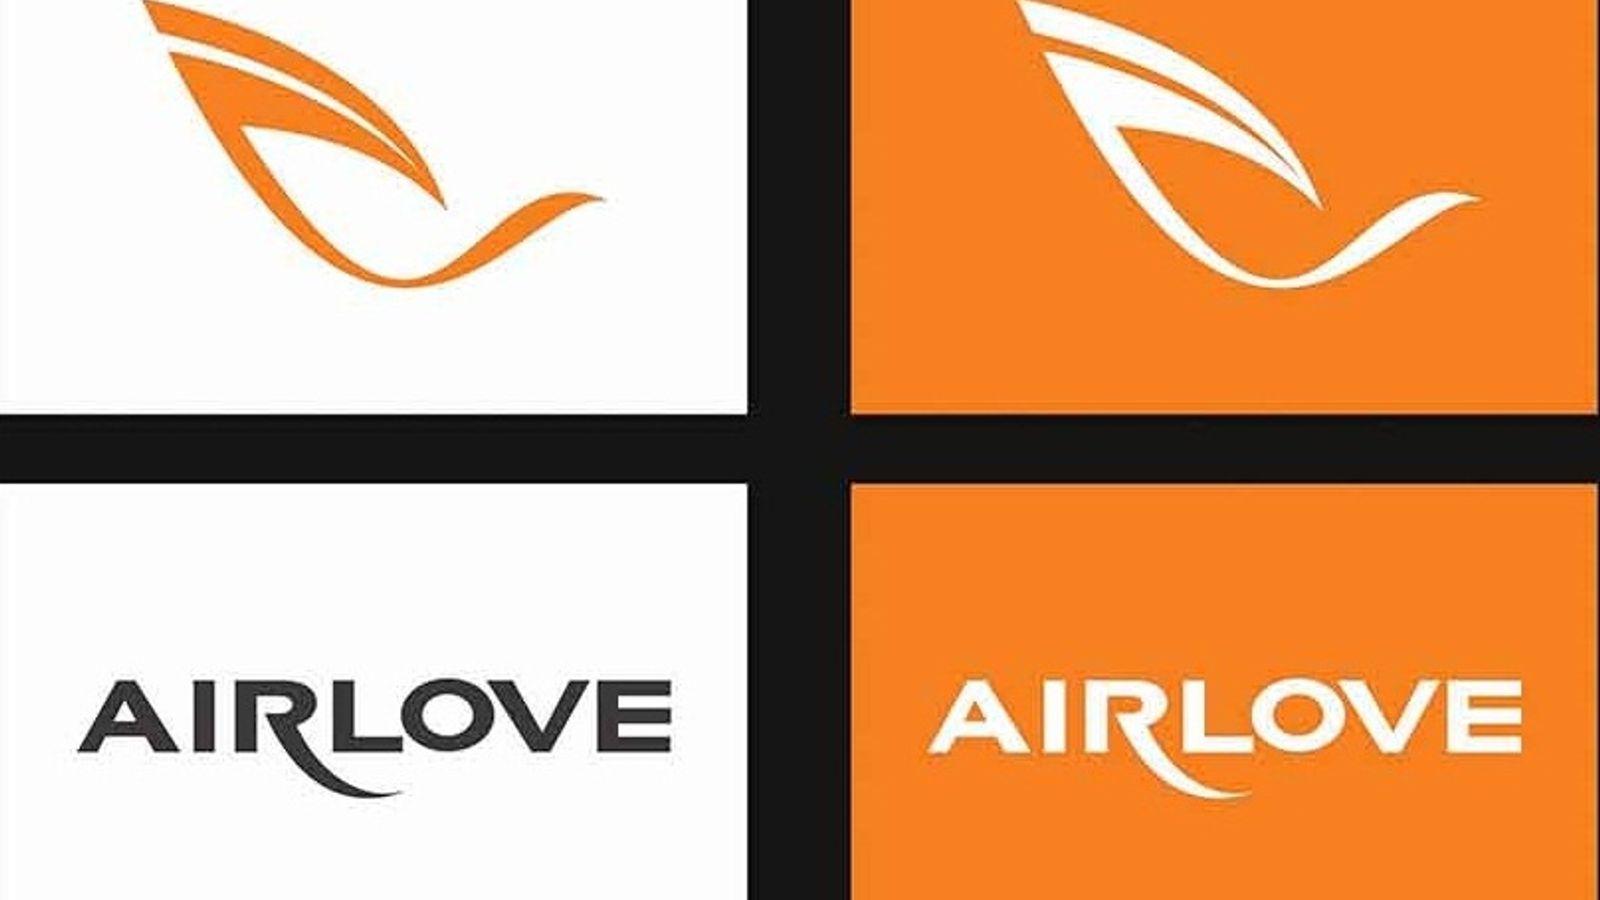 Thiết kế logo Airlove